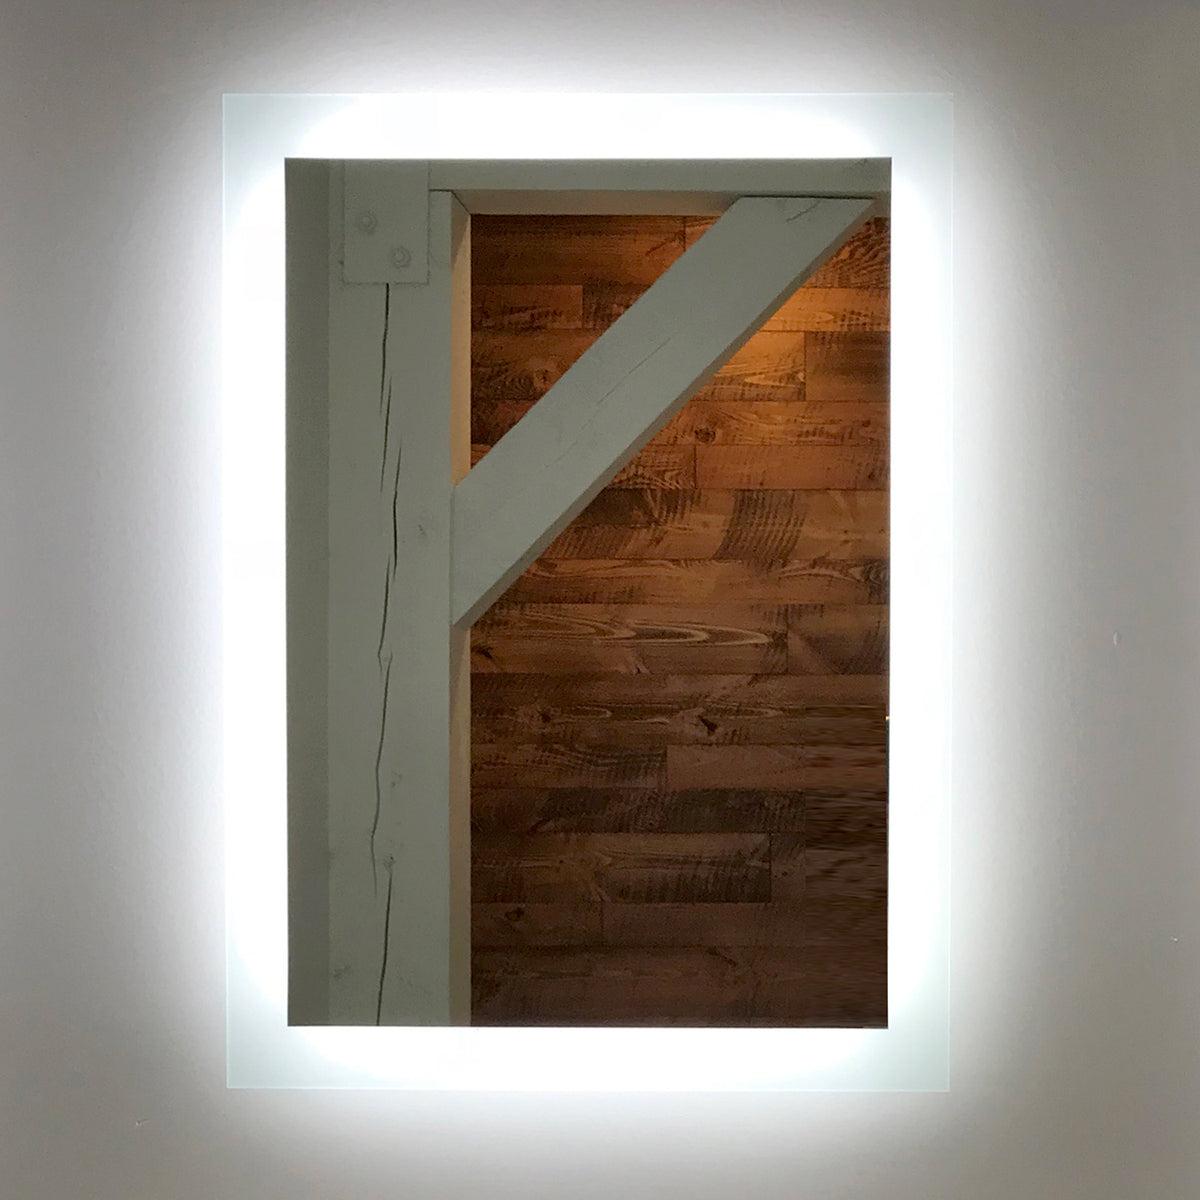 wall hung vanity installation guide